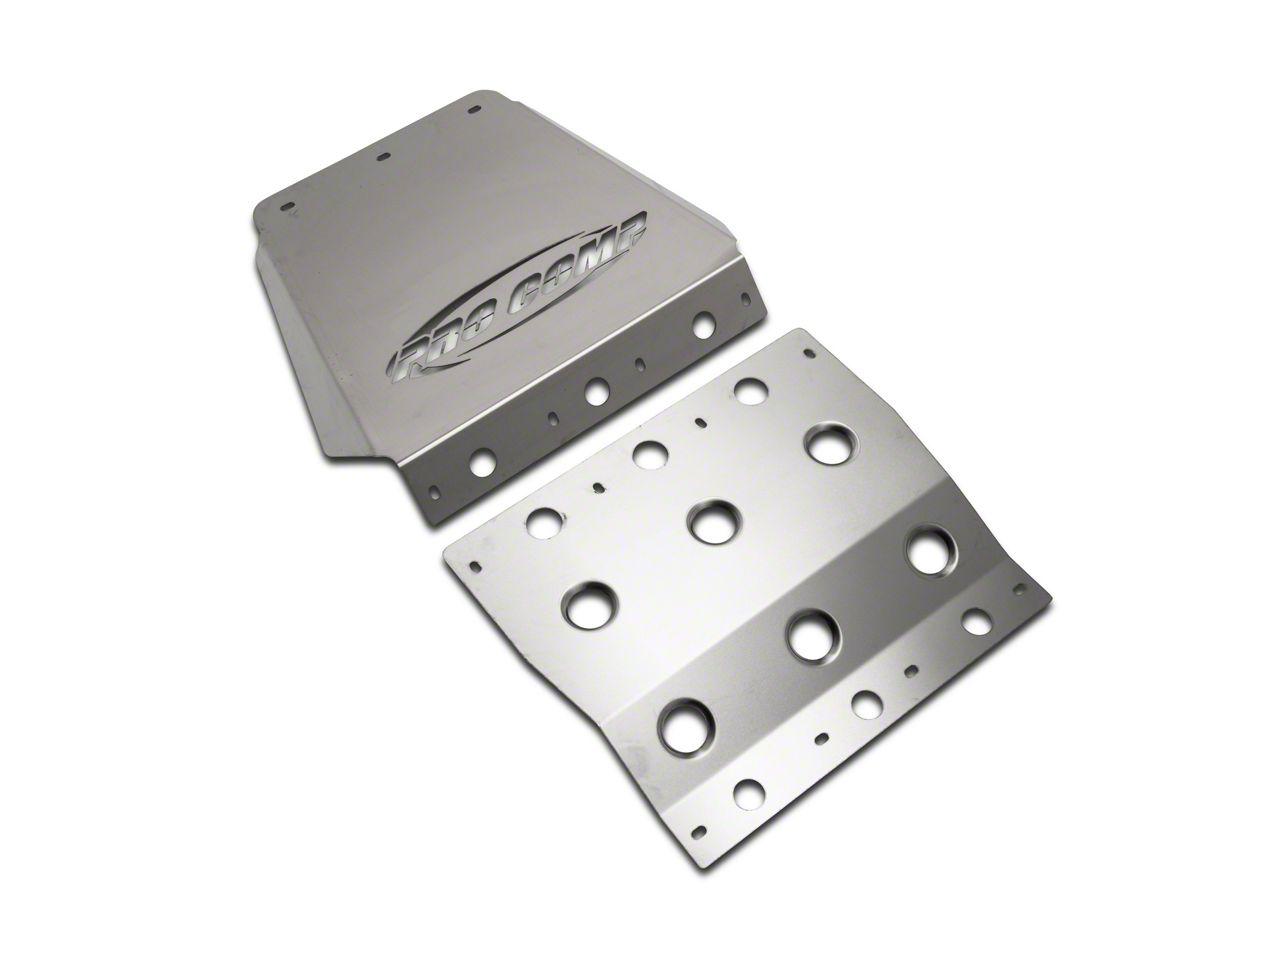 Pro Comp Engine Skid Plate (07-13 Silverado 1500)